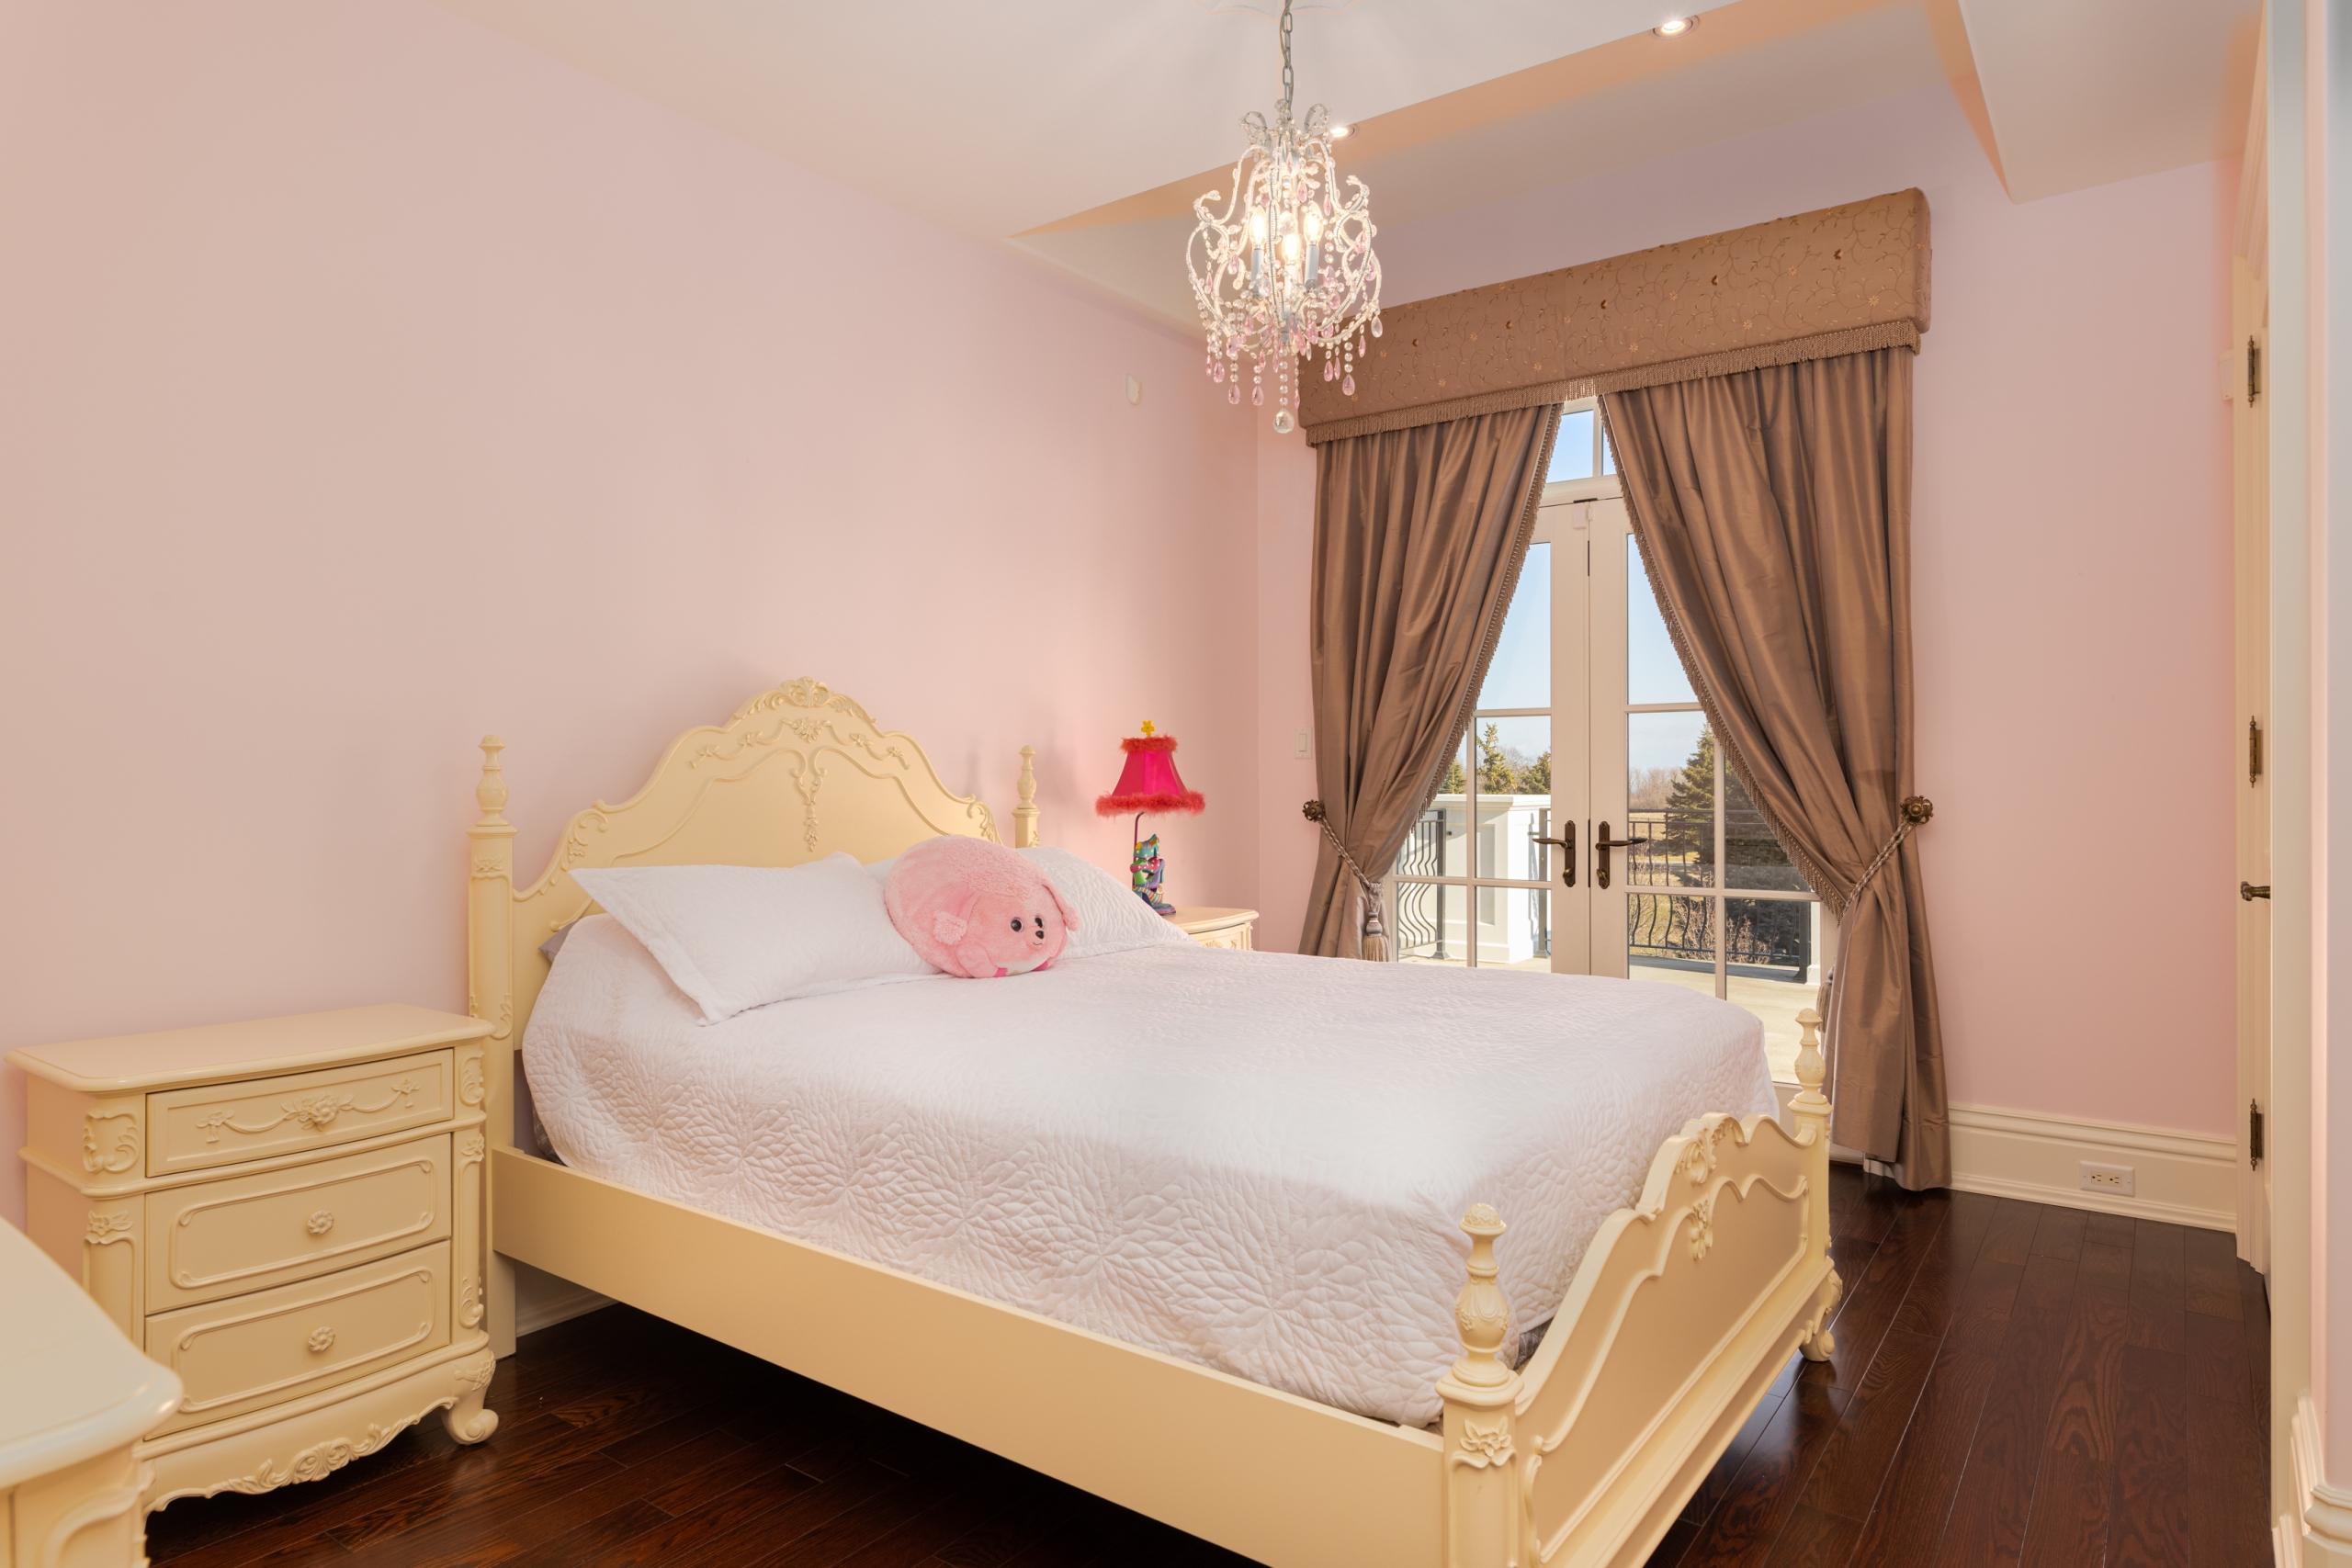 Bedroom featured at 2594 Bluffs Way, Burlington, ON at Alex Irish & Associates